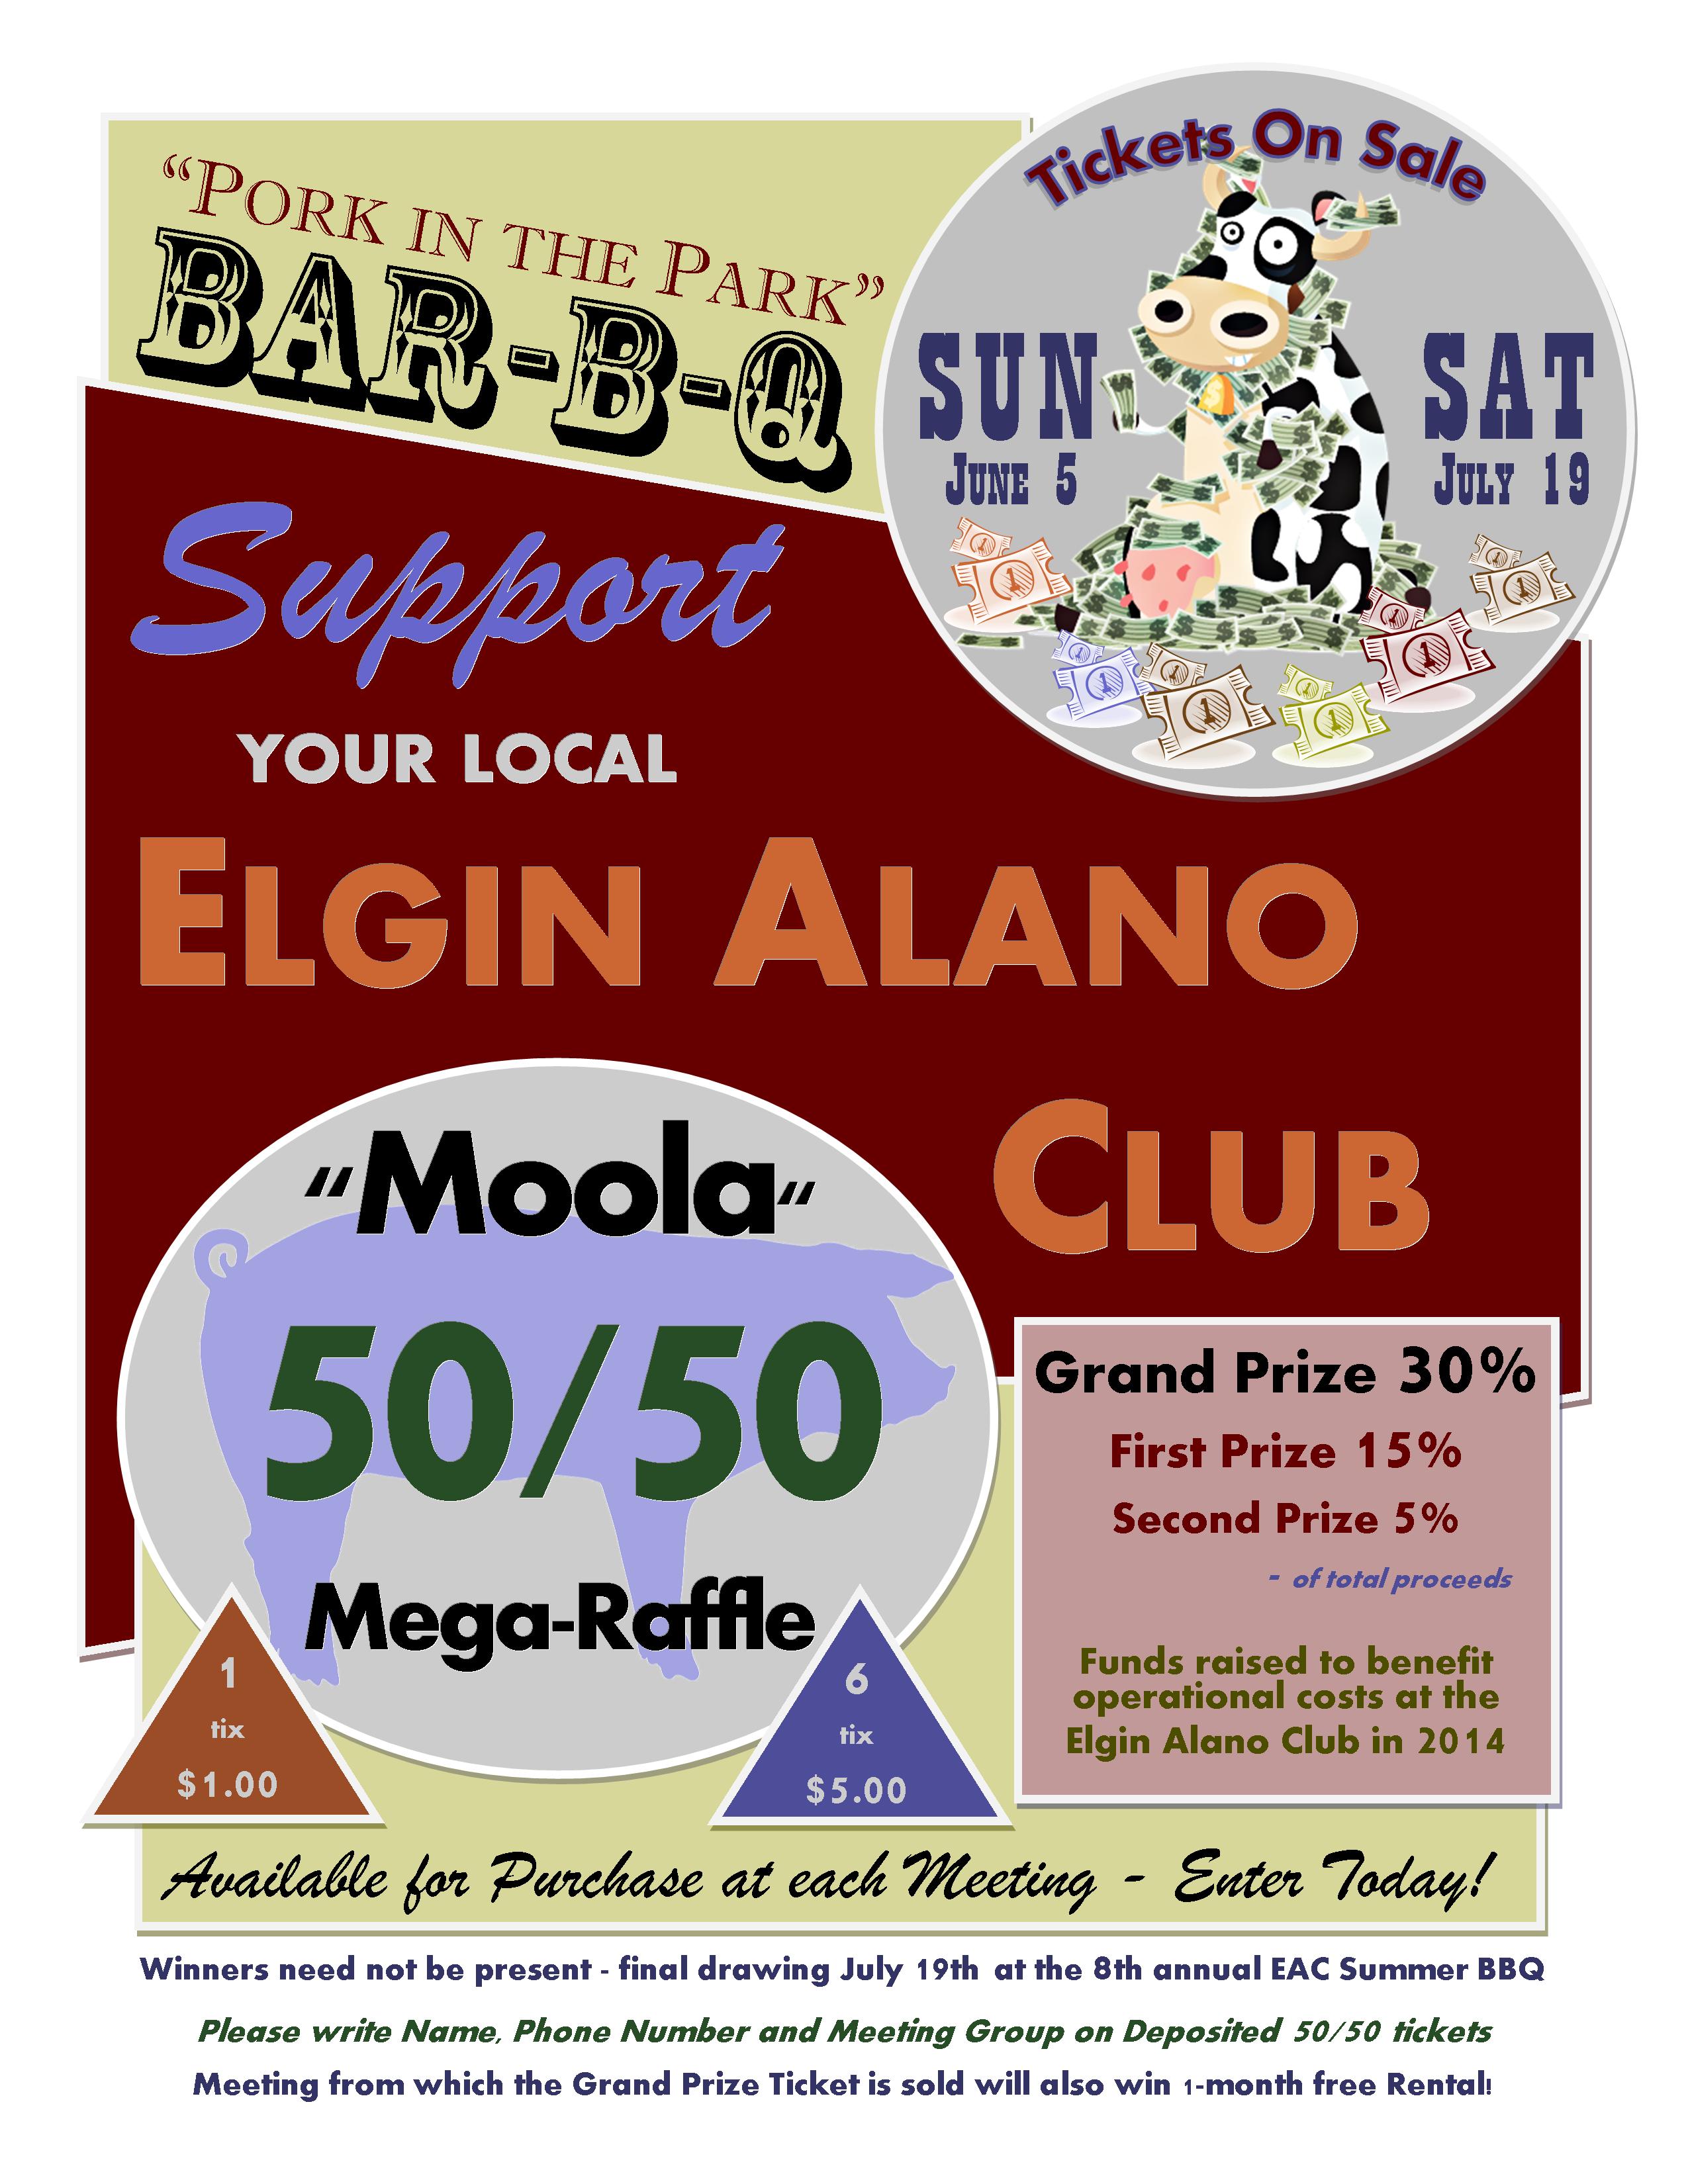 50/50 Mega Raffle - Summer BBQ 5